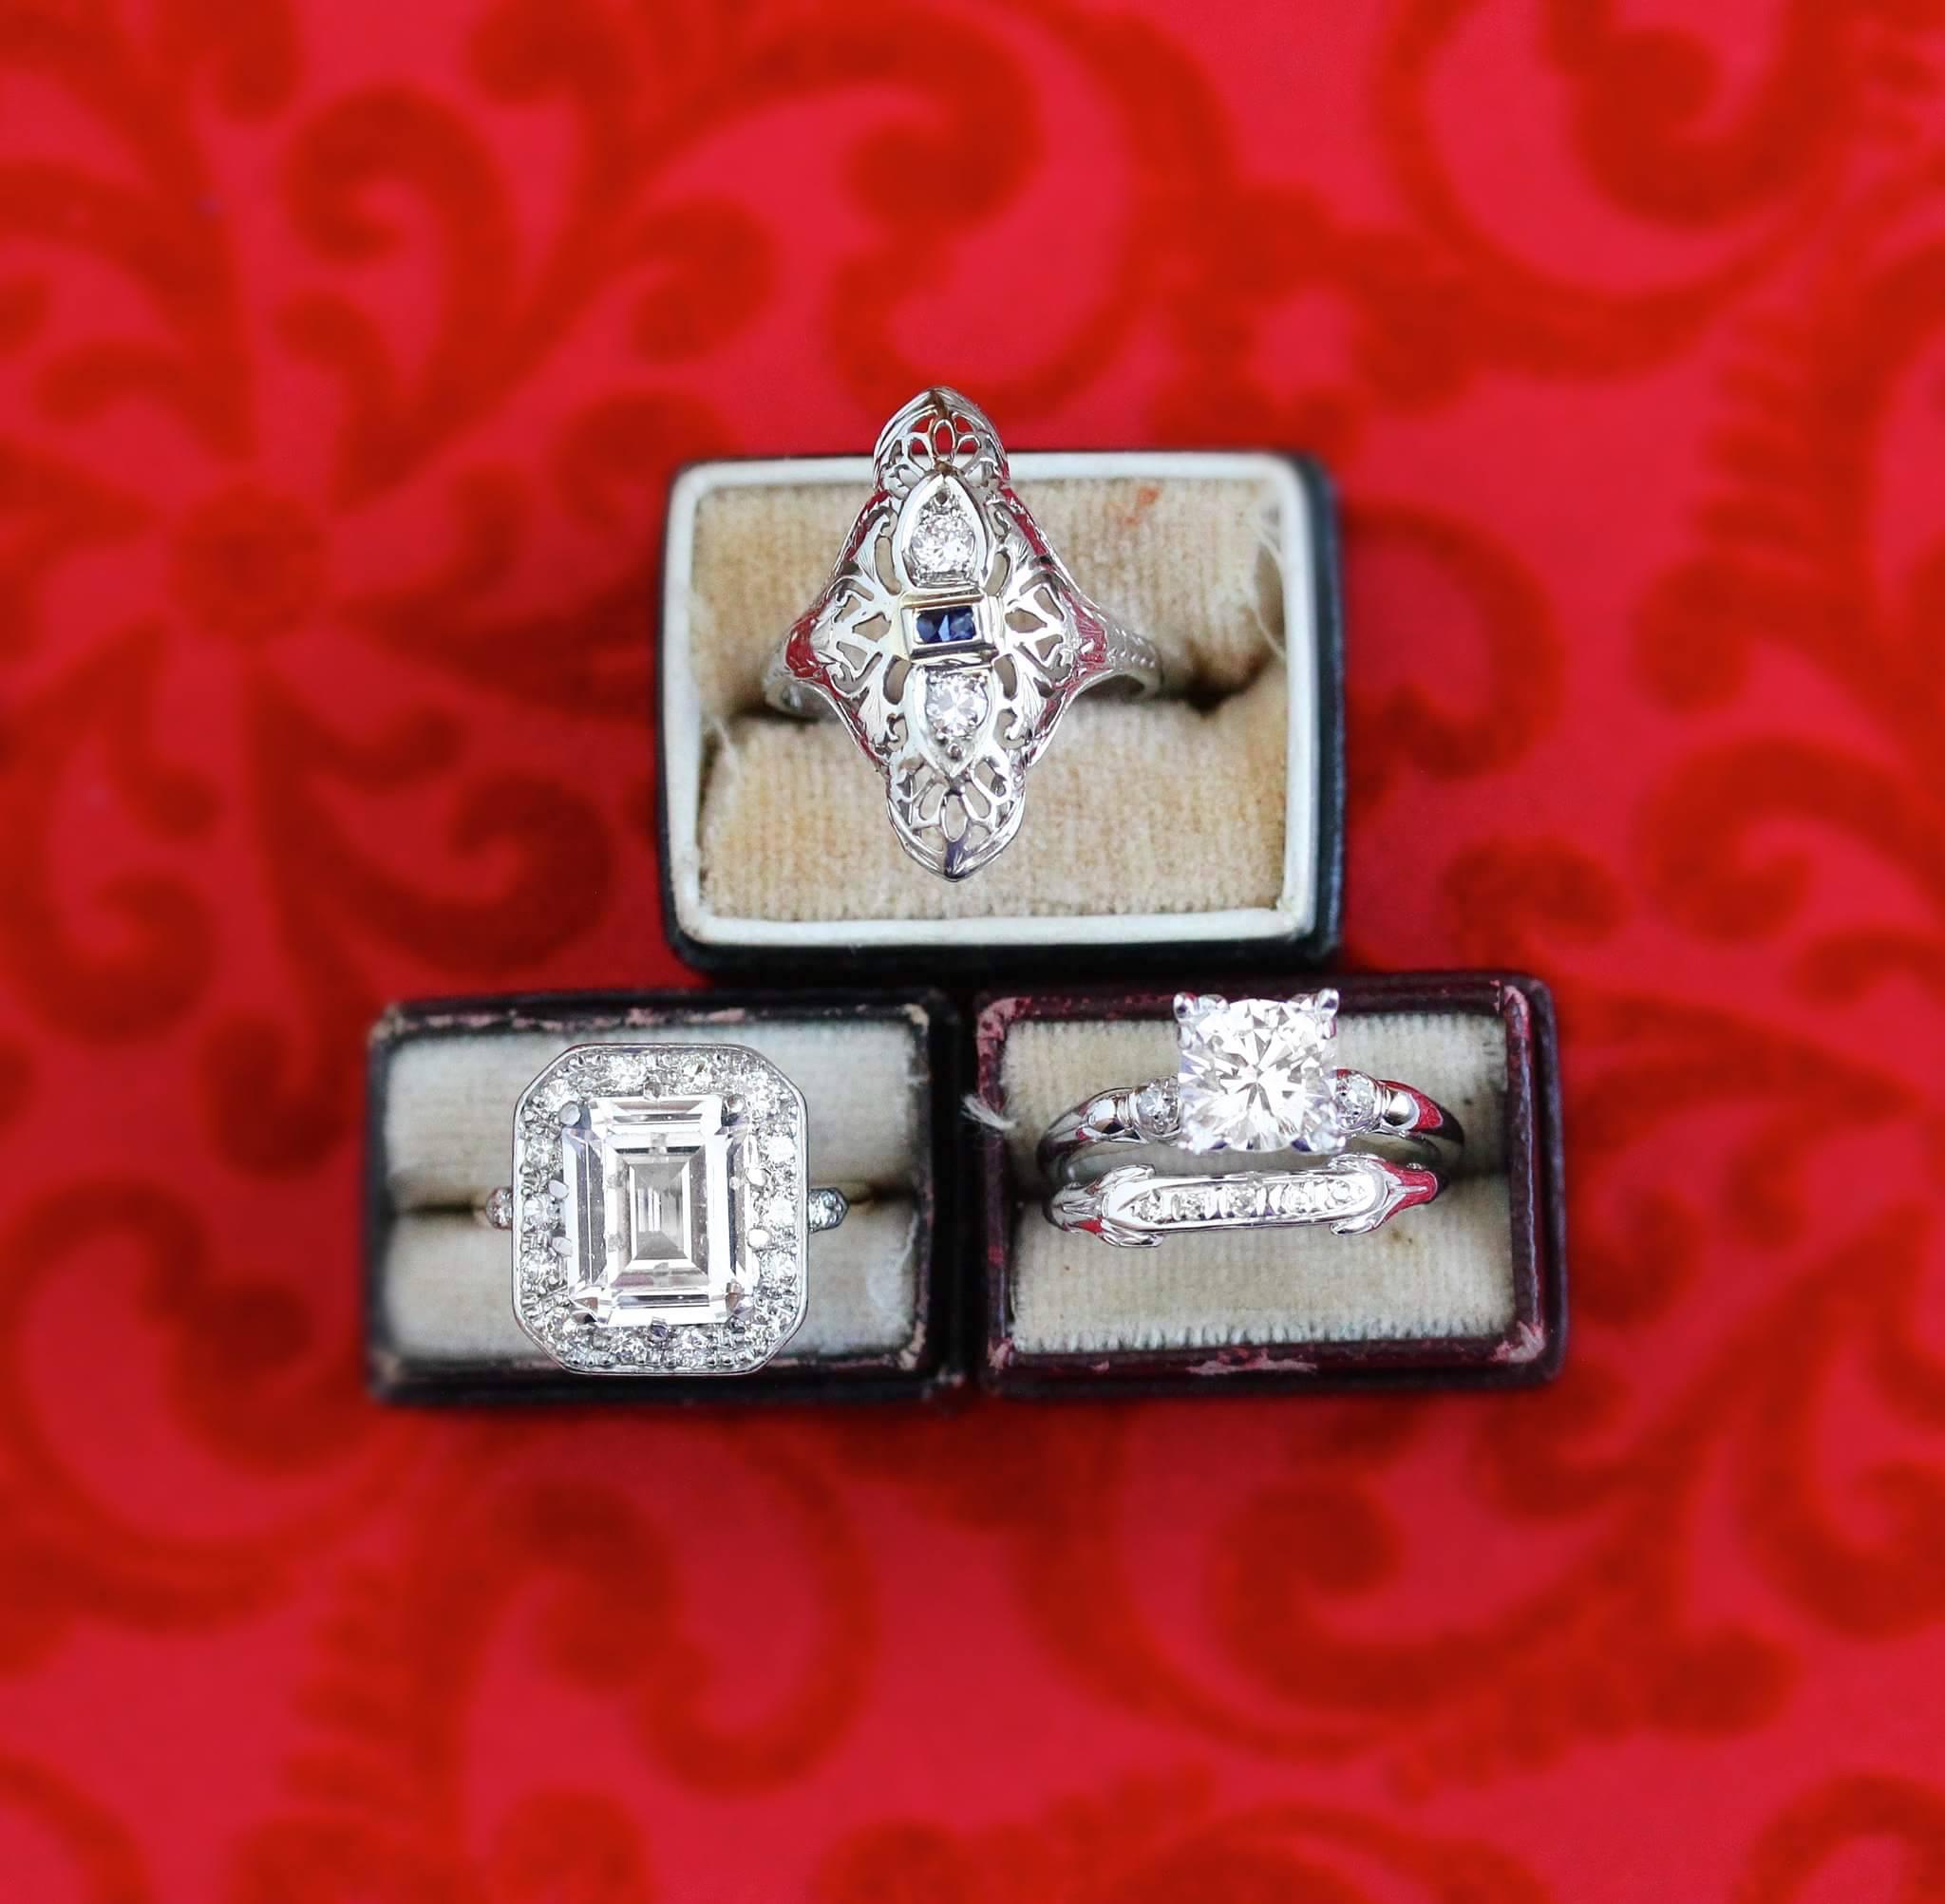 Shop Bottom Left Ring:  Vintage 14K Yellow Gold & Platinum Created White Spinel .48 CTW Diamond Halo Ring